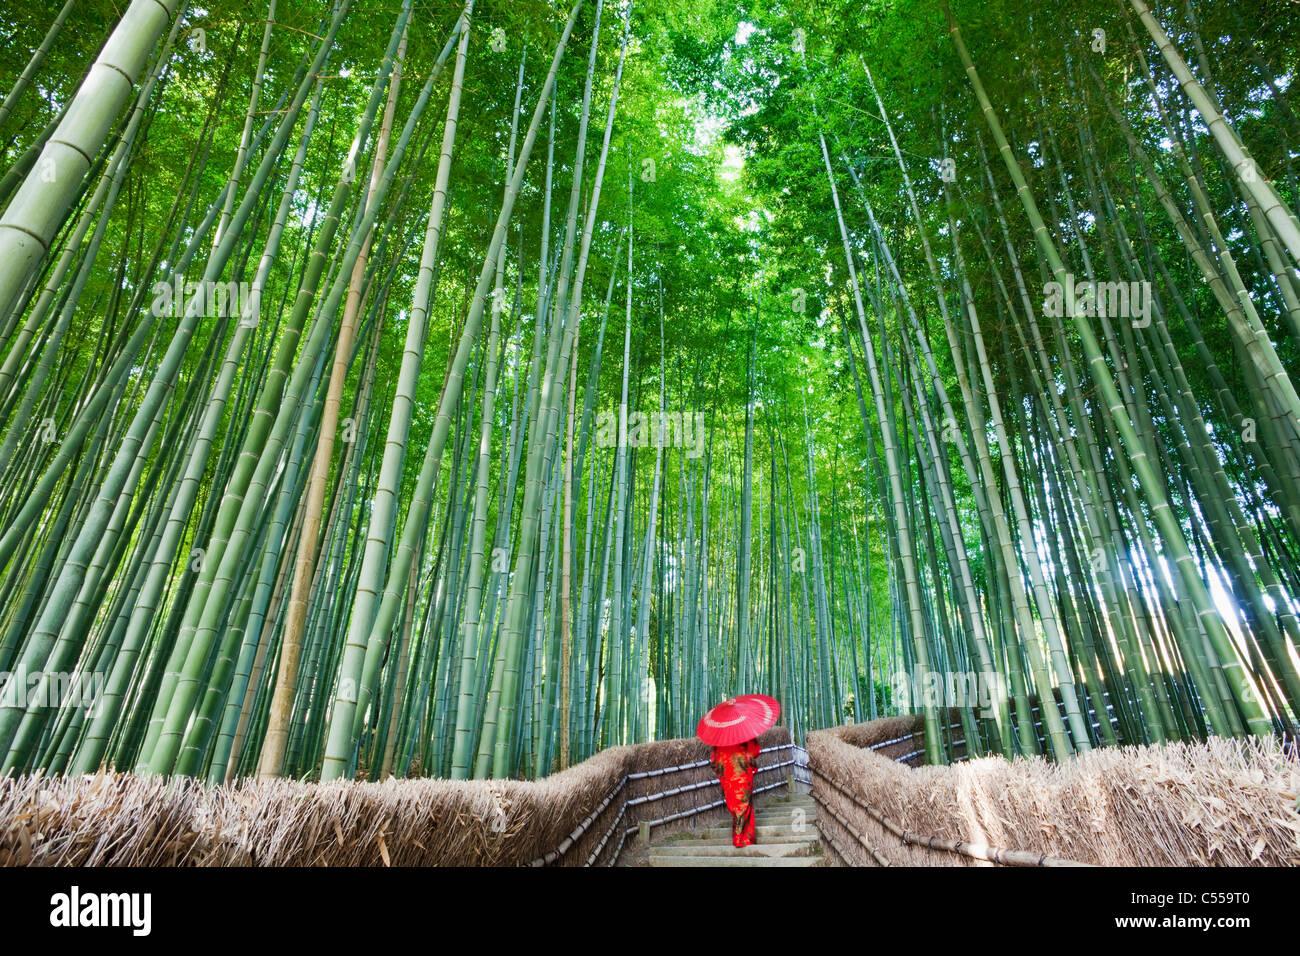 Frau zu Fuß in einem Bambuswald Adashino-Nenbutsu-Ji-Tempel, Arashiyama, Kyoto Prefecture, Kinki Region Honshu, Stockfoto